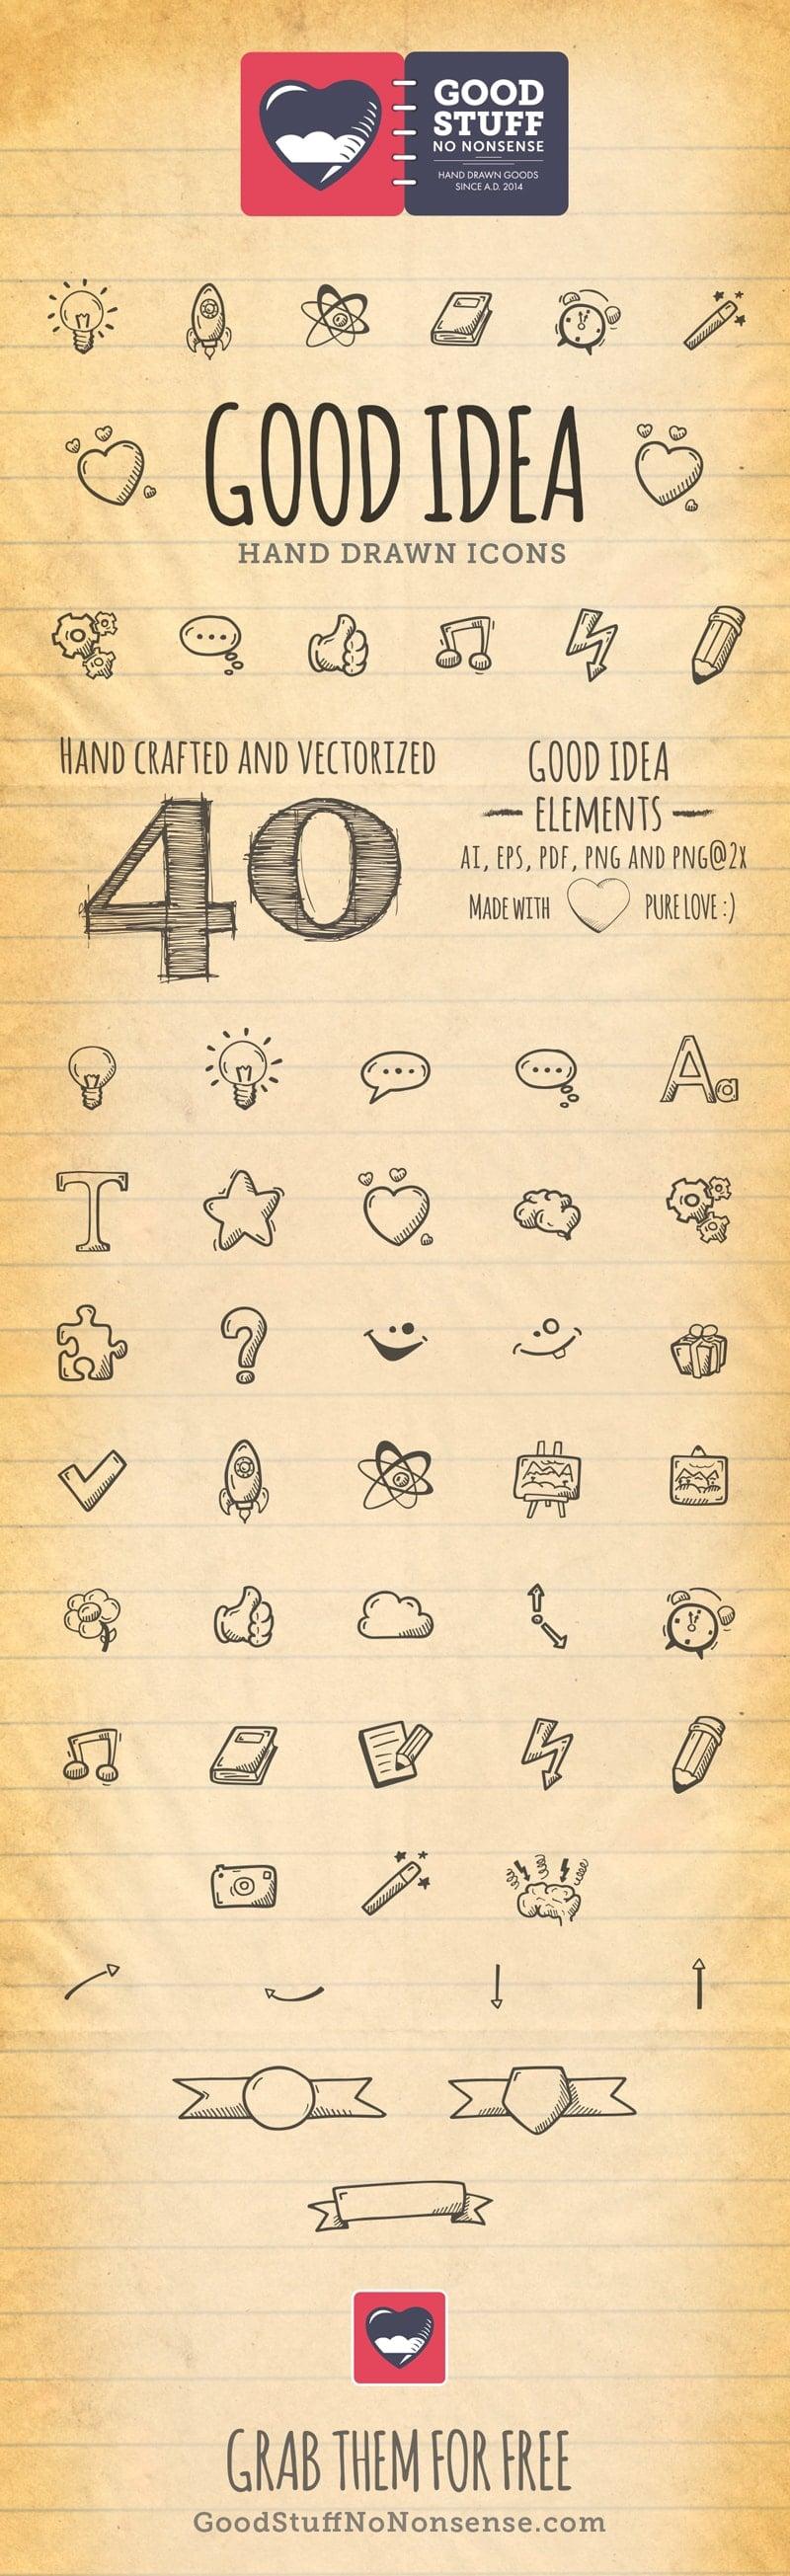 Free Good Idea Icons - Hand Drawn Icons